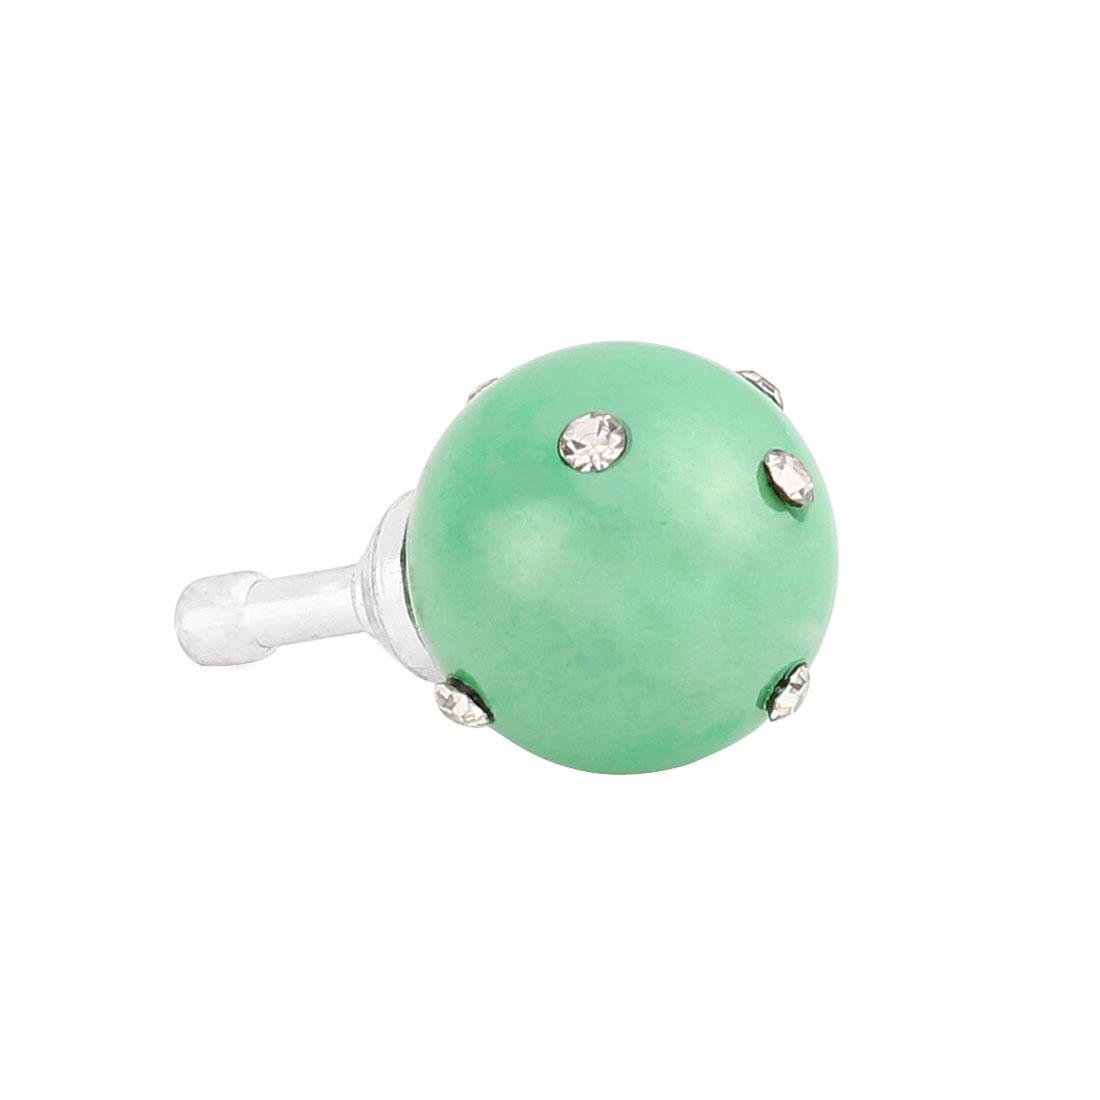 Green Faux Pearl Rhinestone 3.5mm Earphone Anti Dust Plug Cap Stopper for Phone